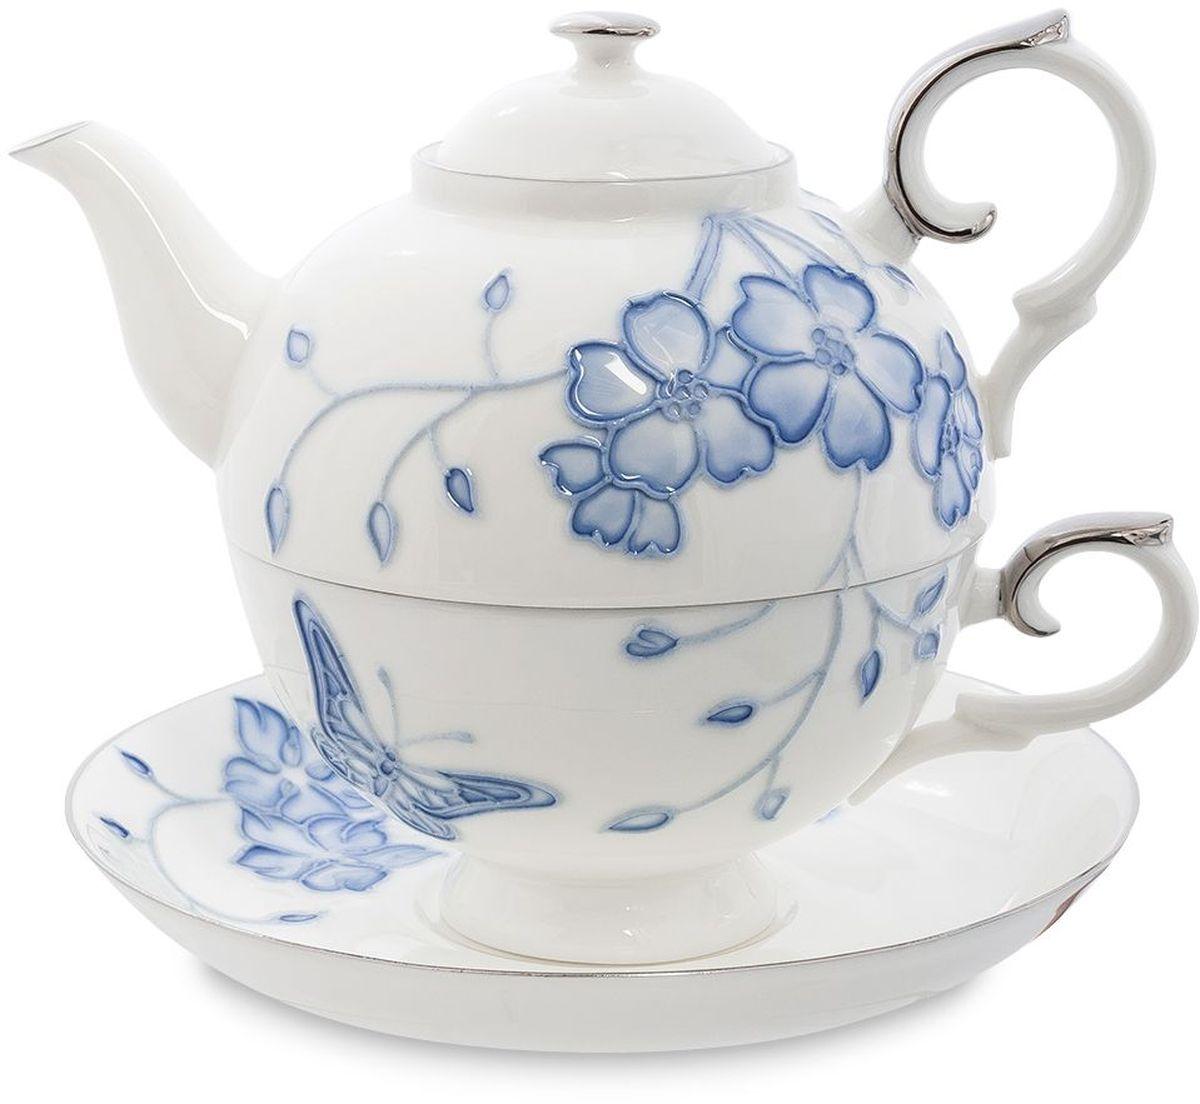 Набор чайный Pavone Голубая бабочка, 3 предмета. 451604451604Объем чайника: 400 мл Объем чаши: 250 мл Диаметр блюдца: 15 см